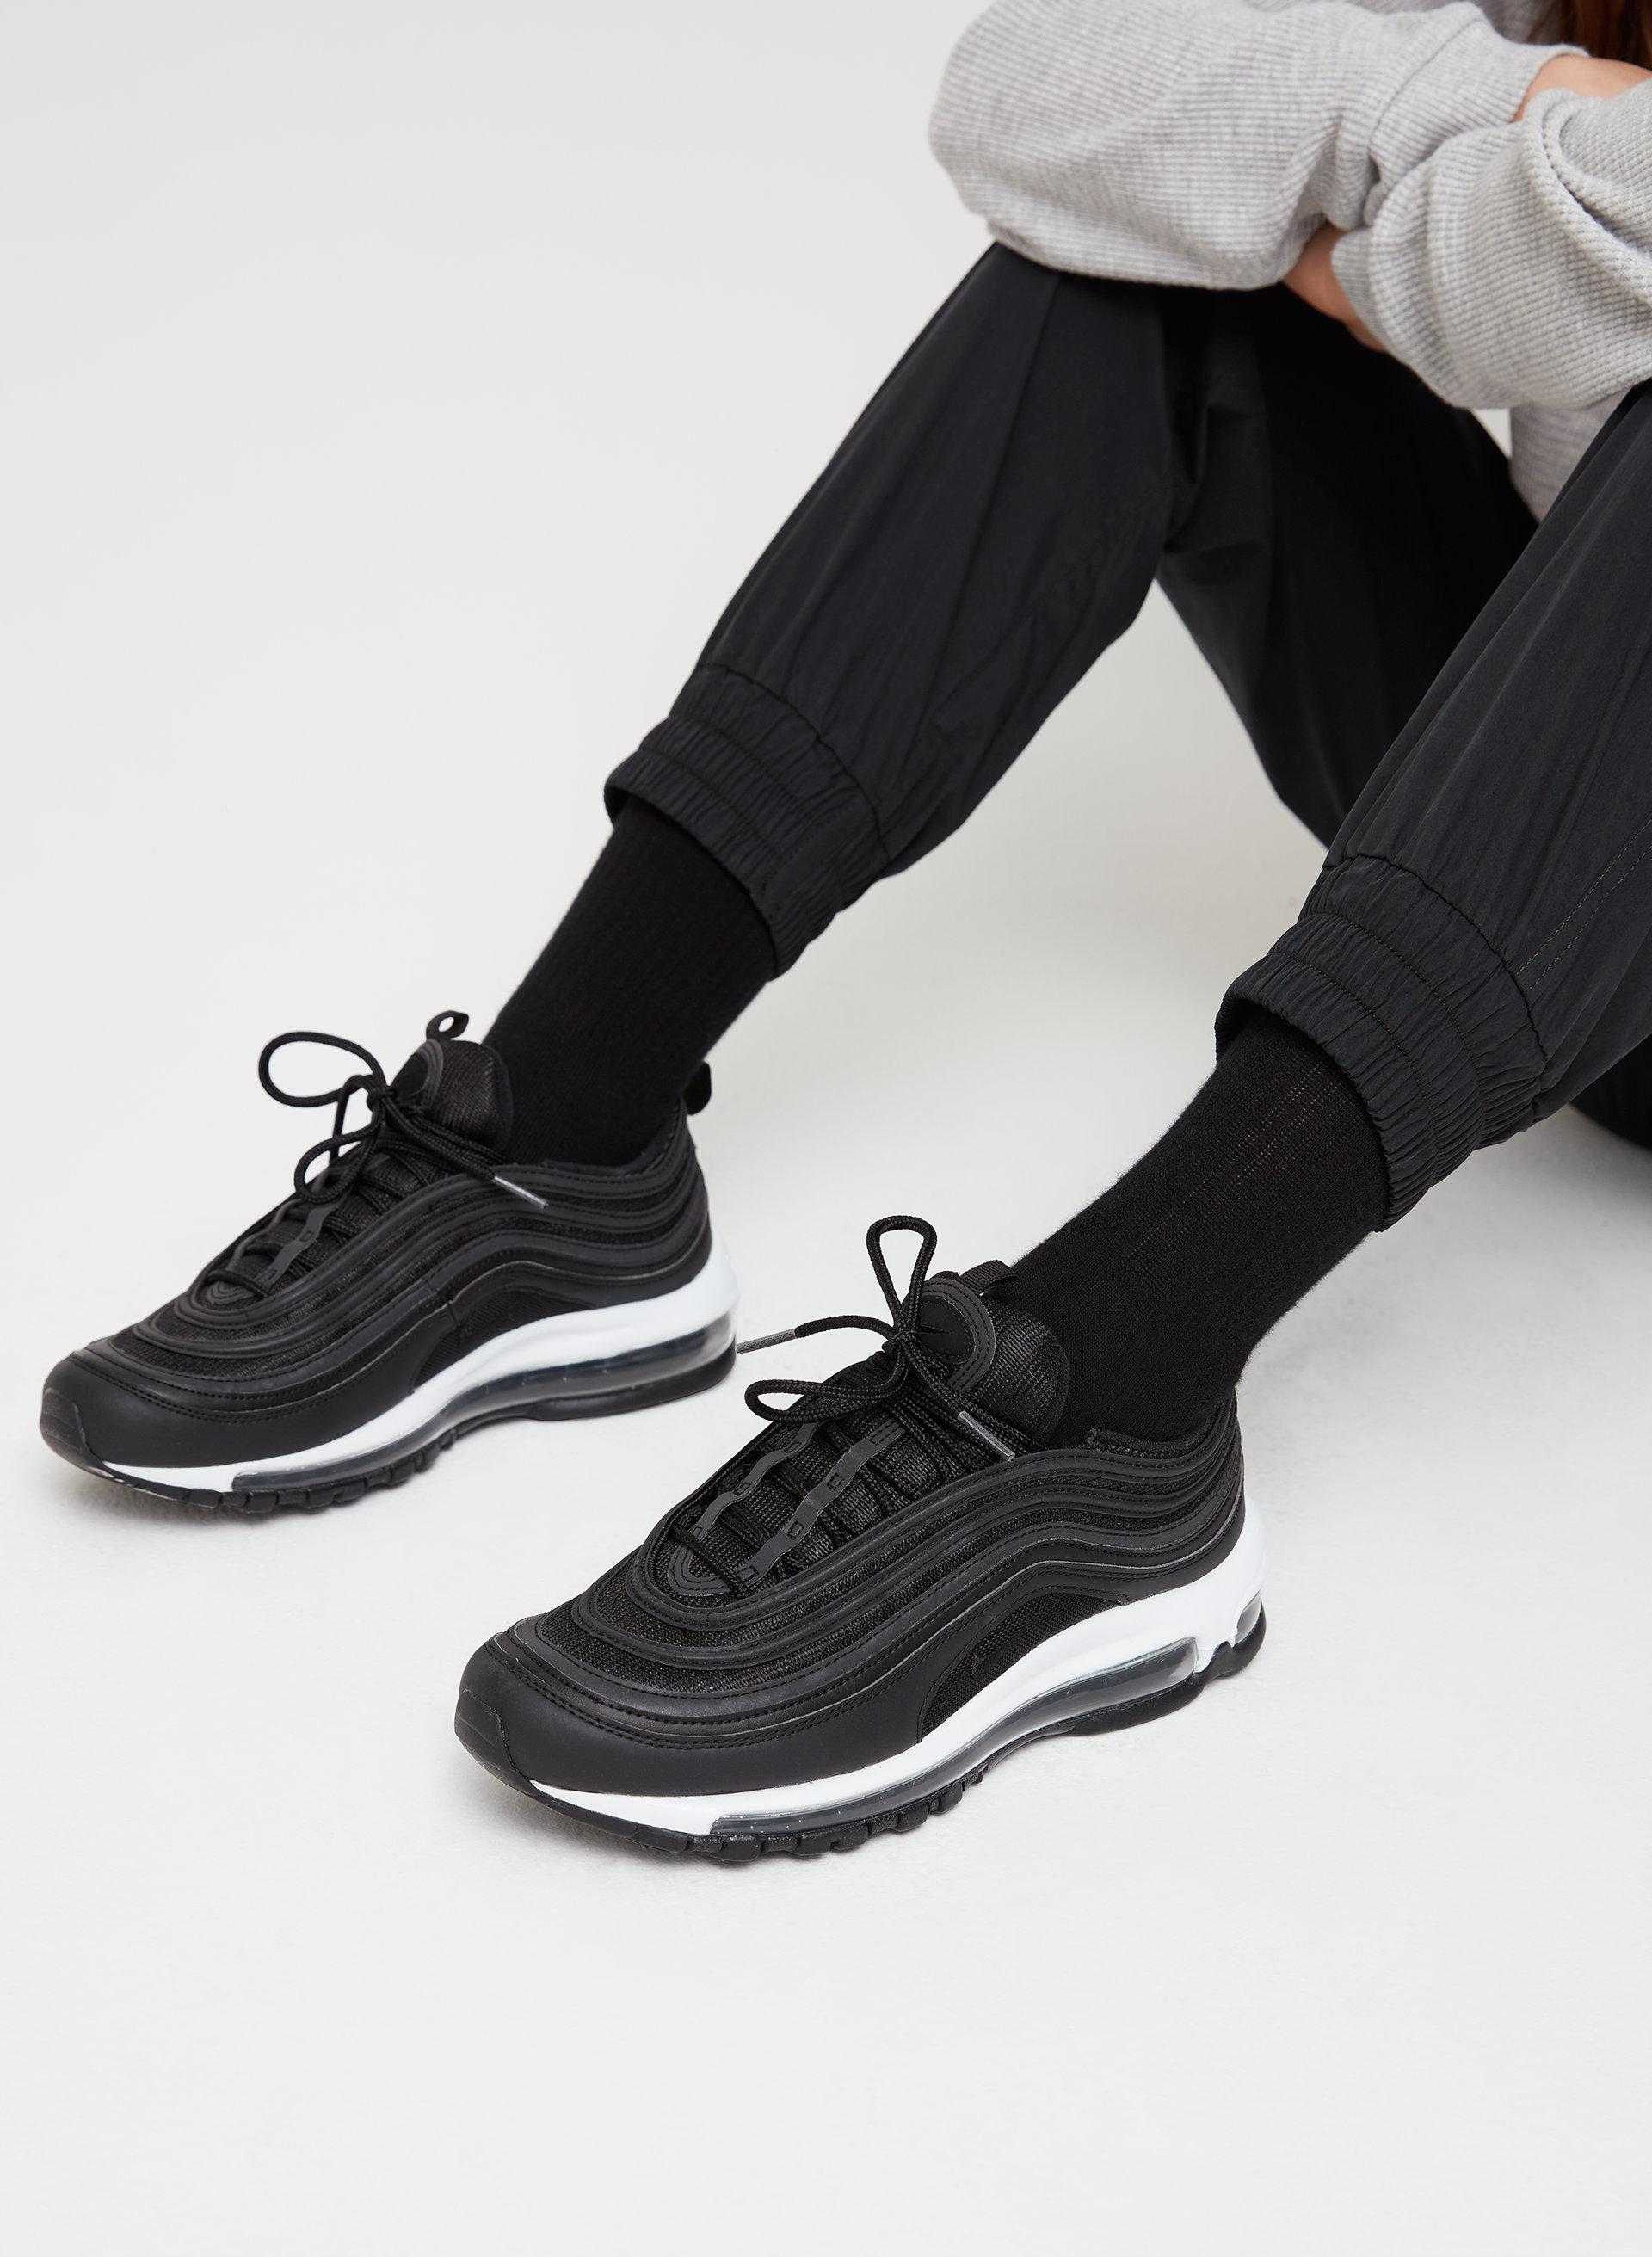 buy online 3008e cccef Nike AIR MAX 97 | Aritzia CA